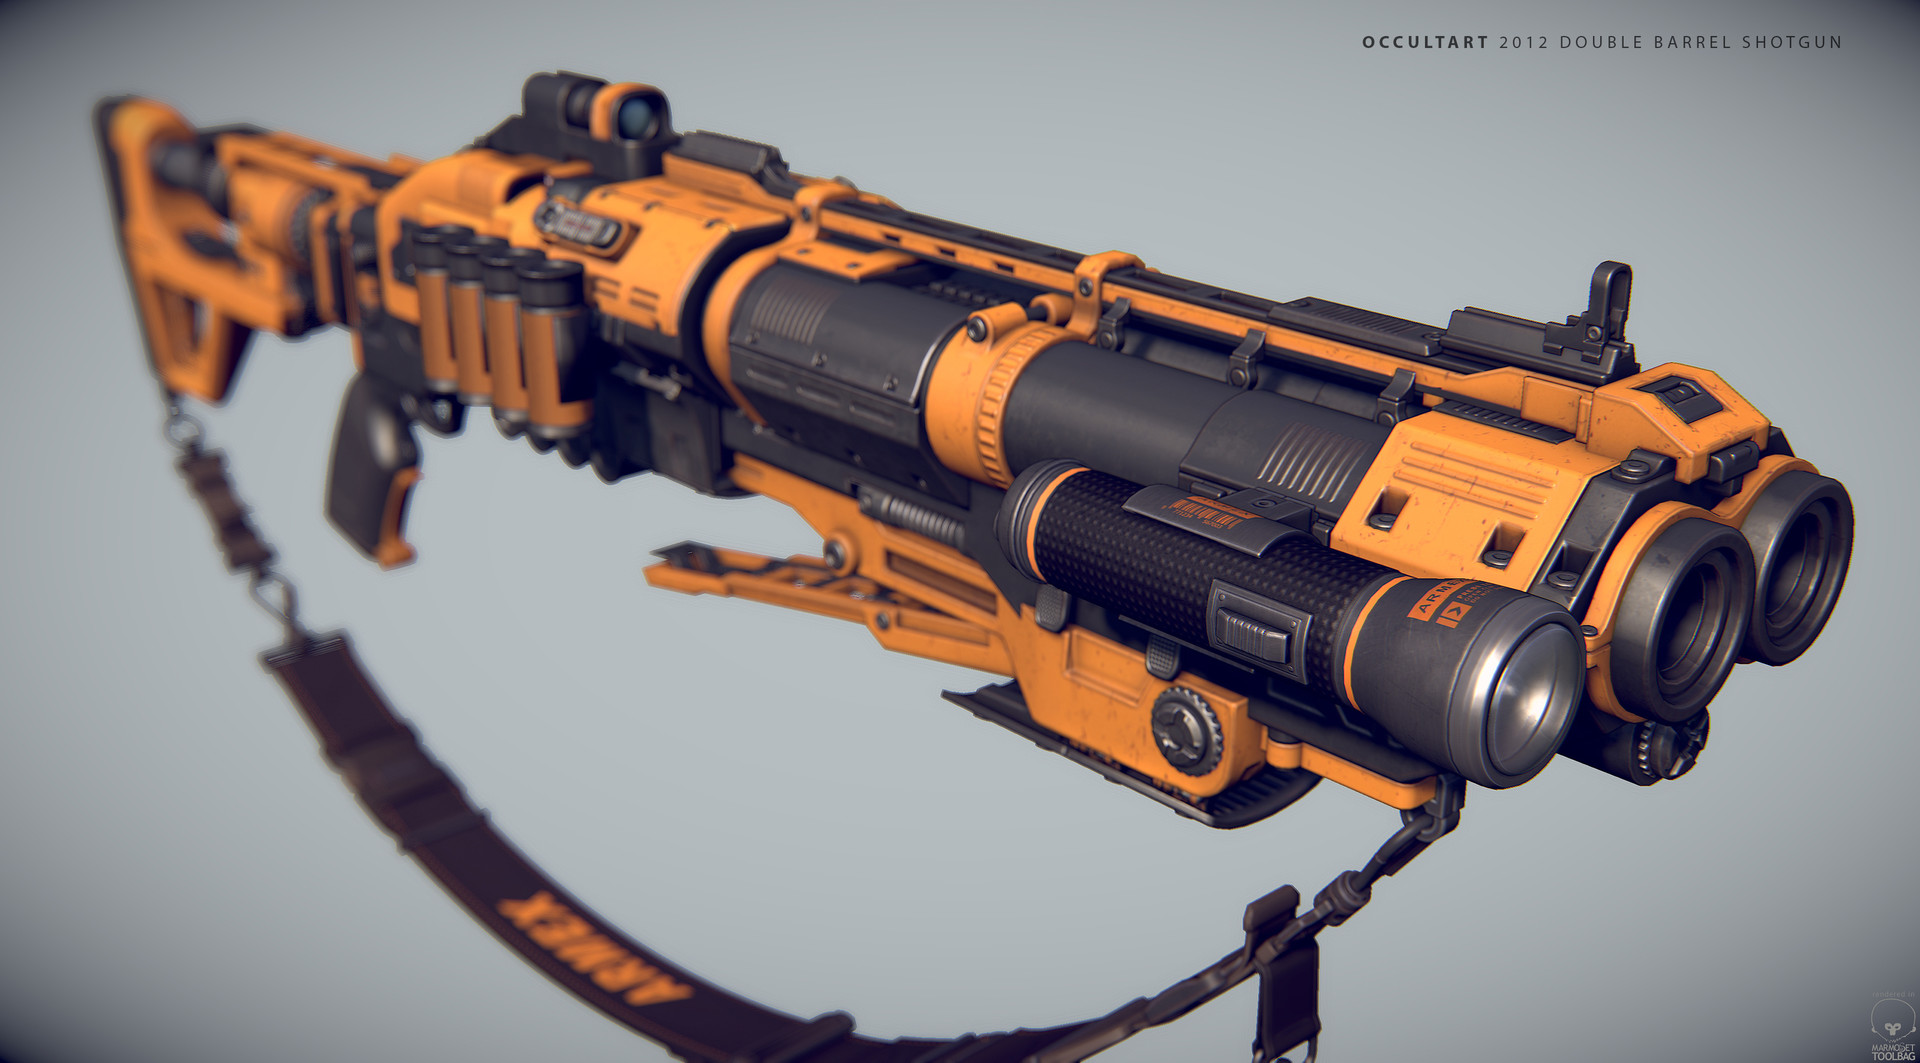 K09121科幻类 武器 枪械 装备2093p 图片素材